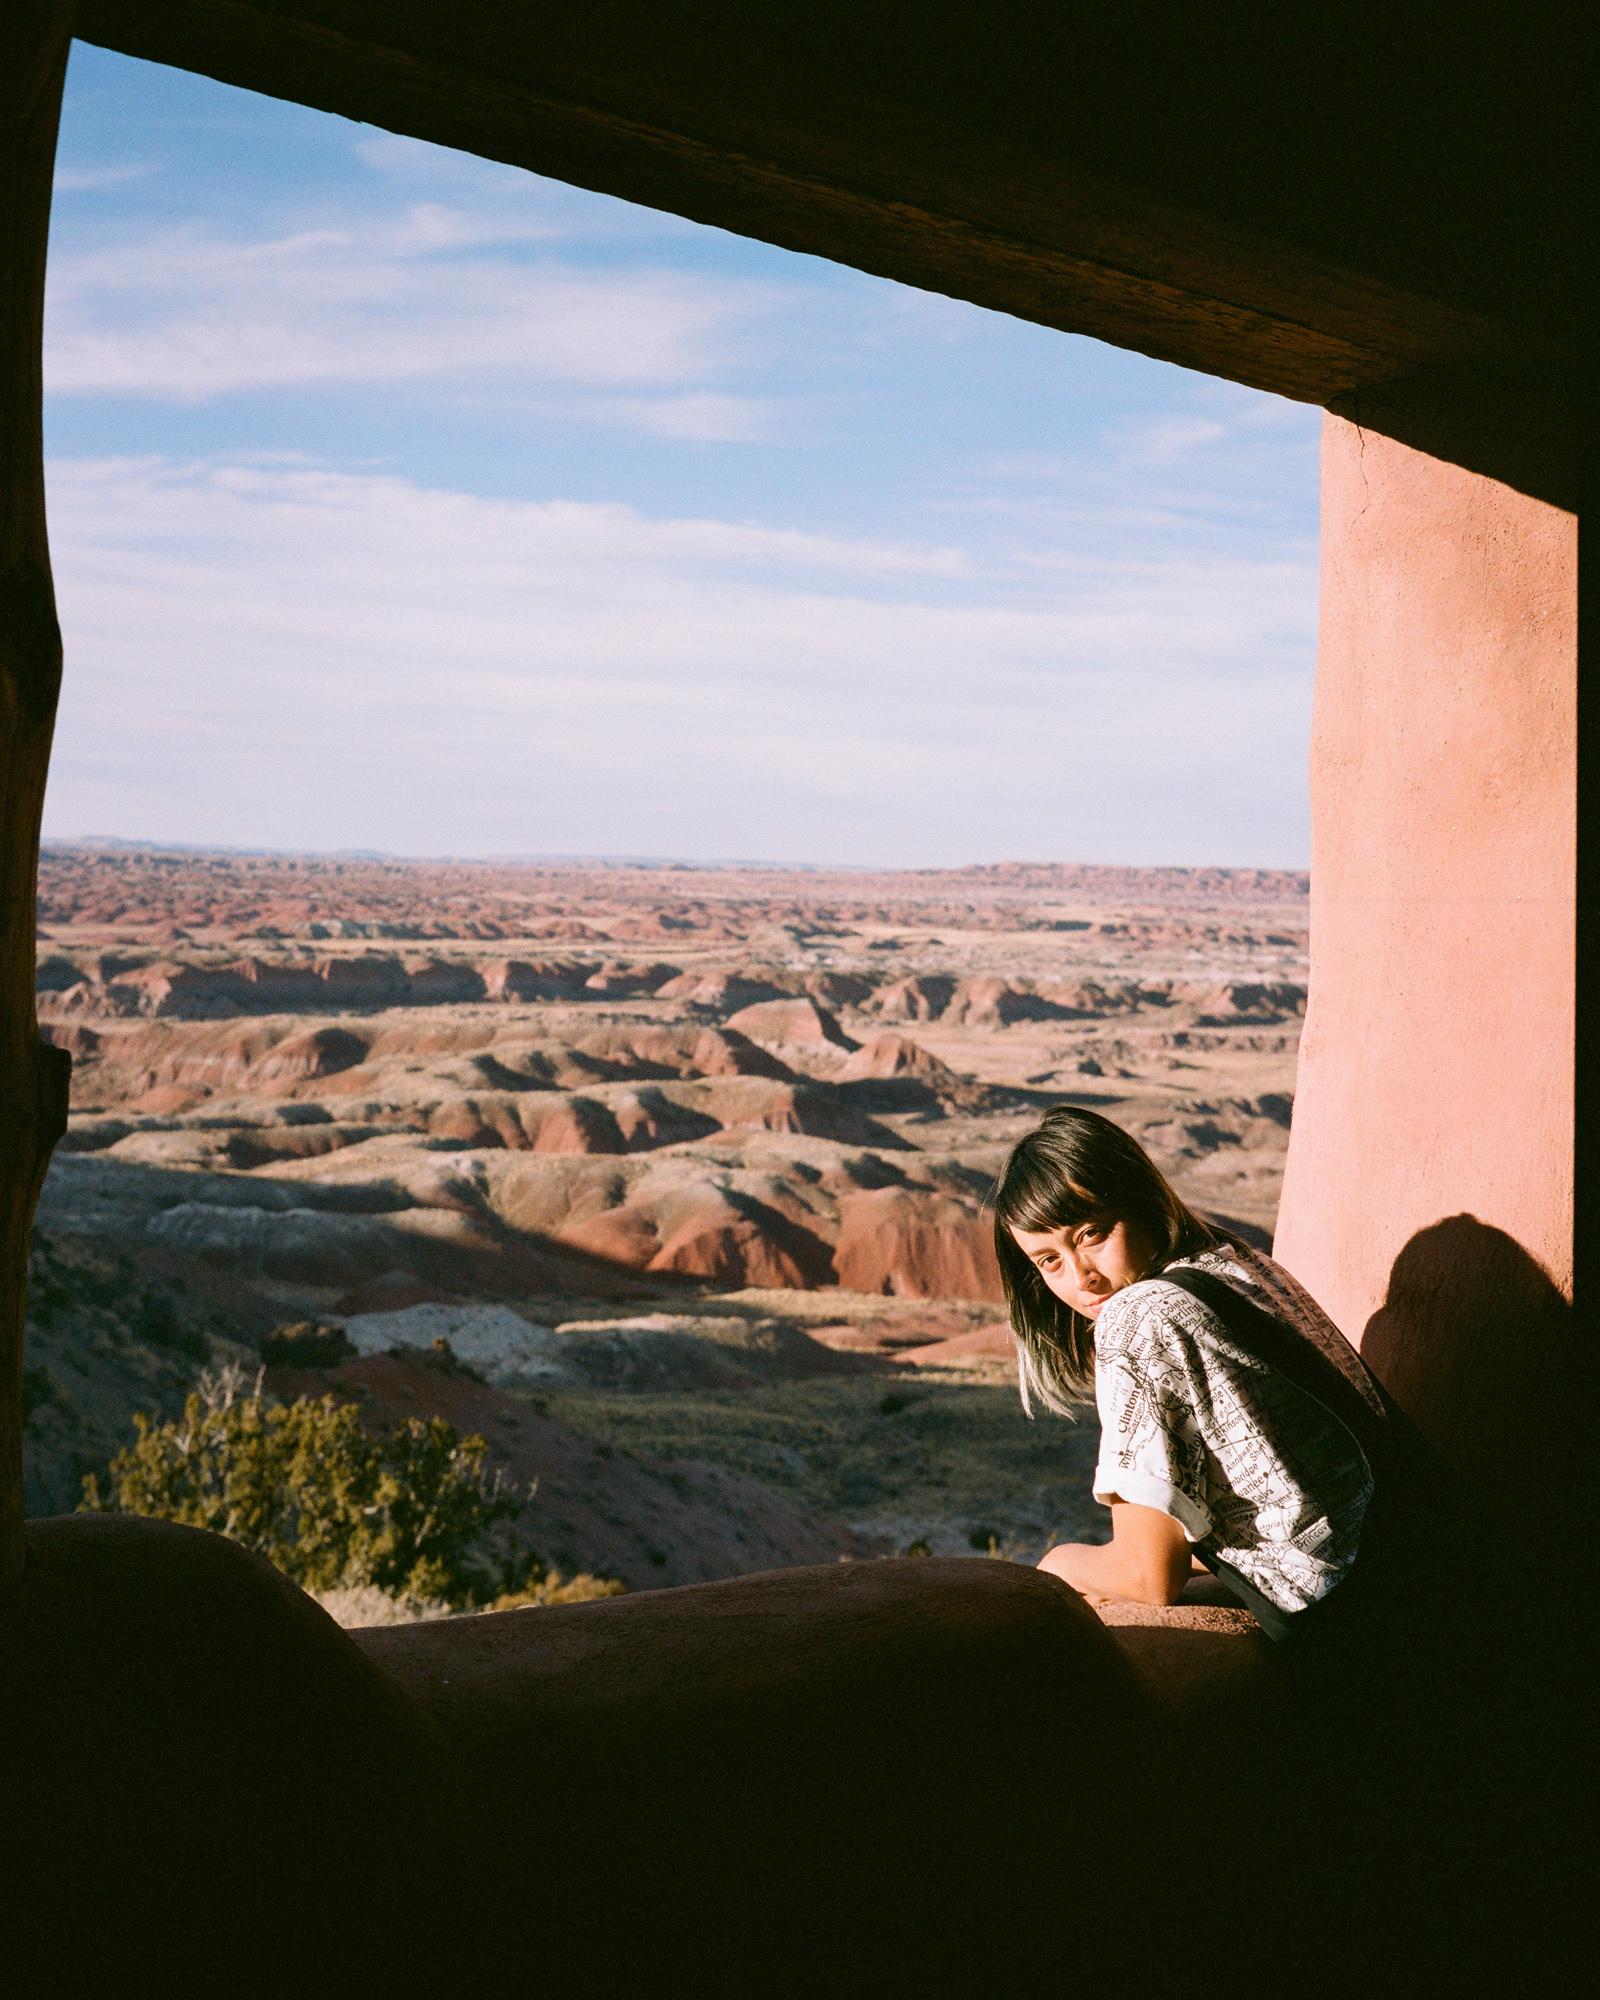 Overlooking the Painted Desert from the historic Painted Desert Inn.